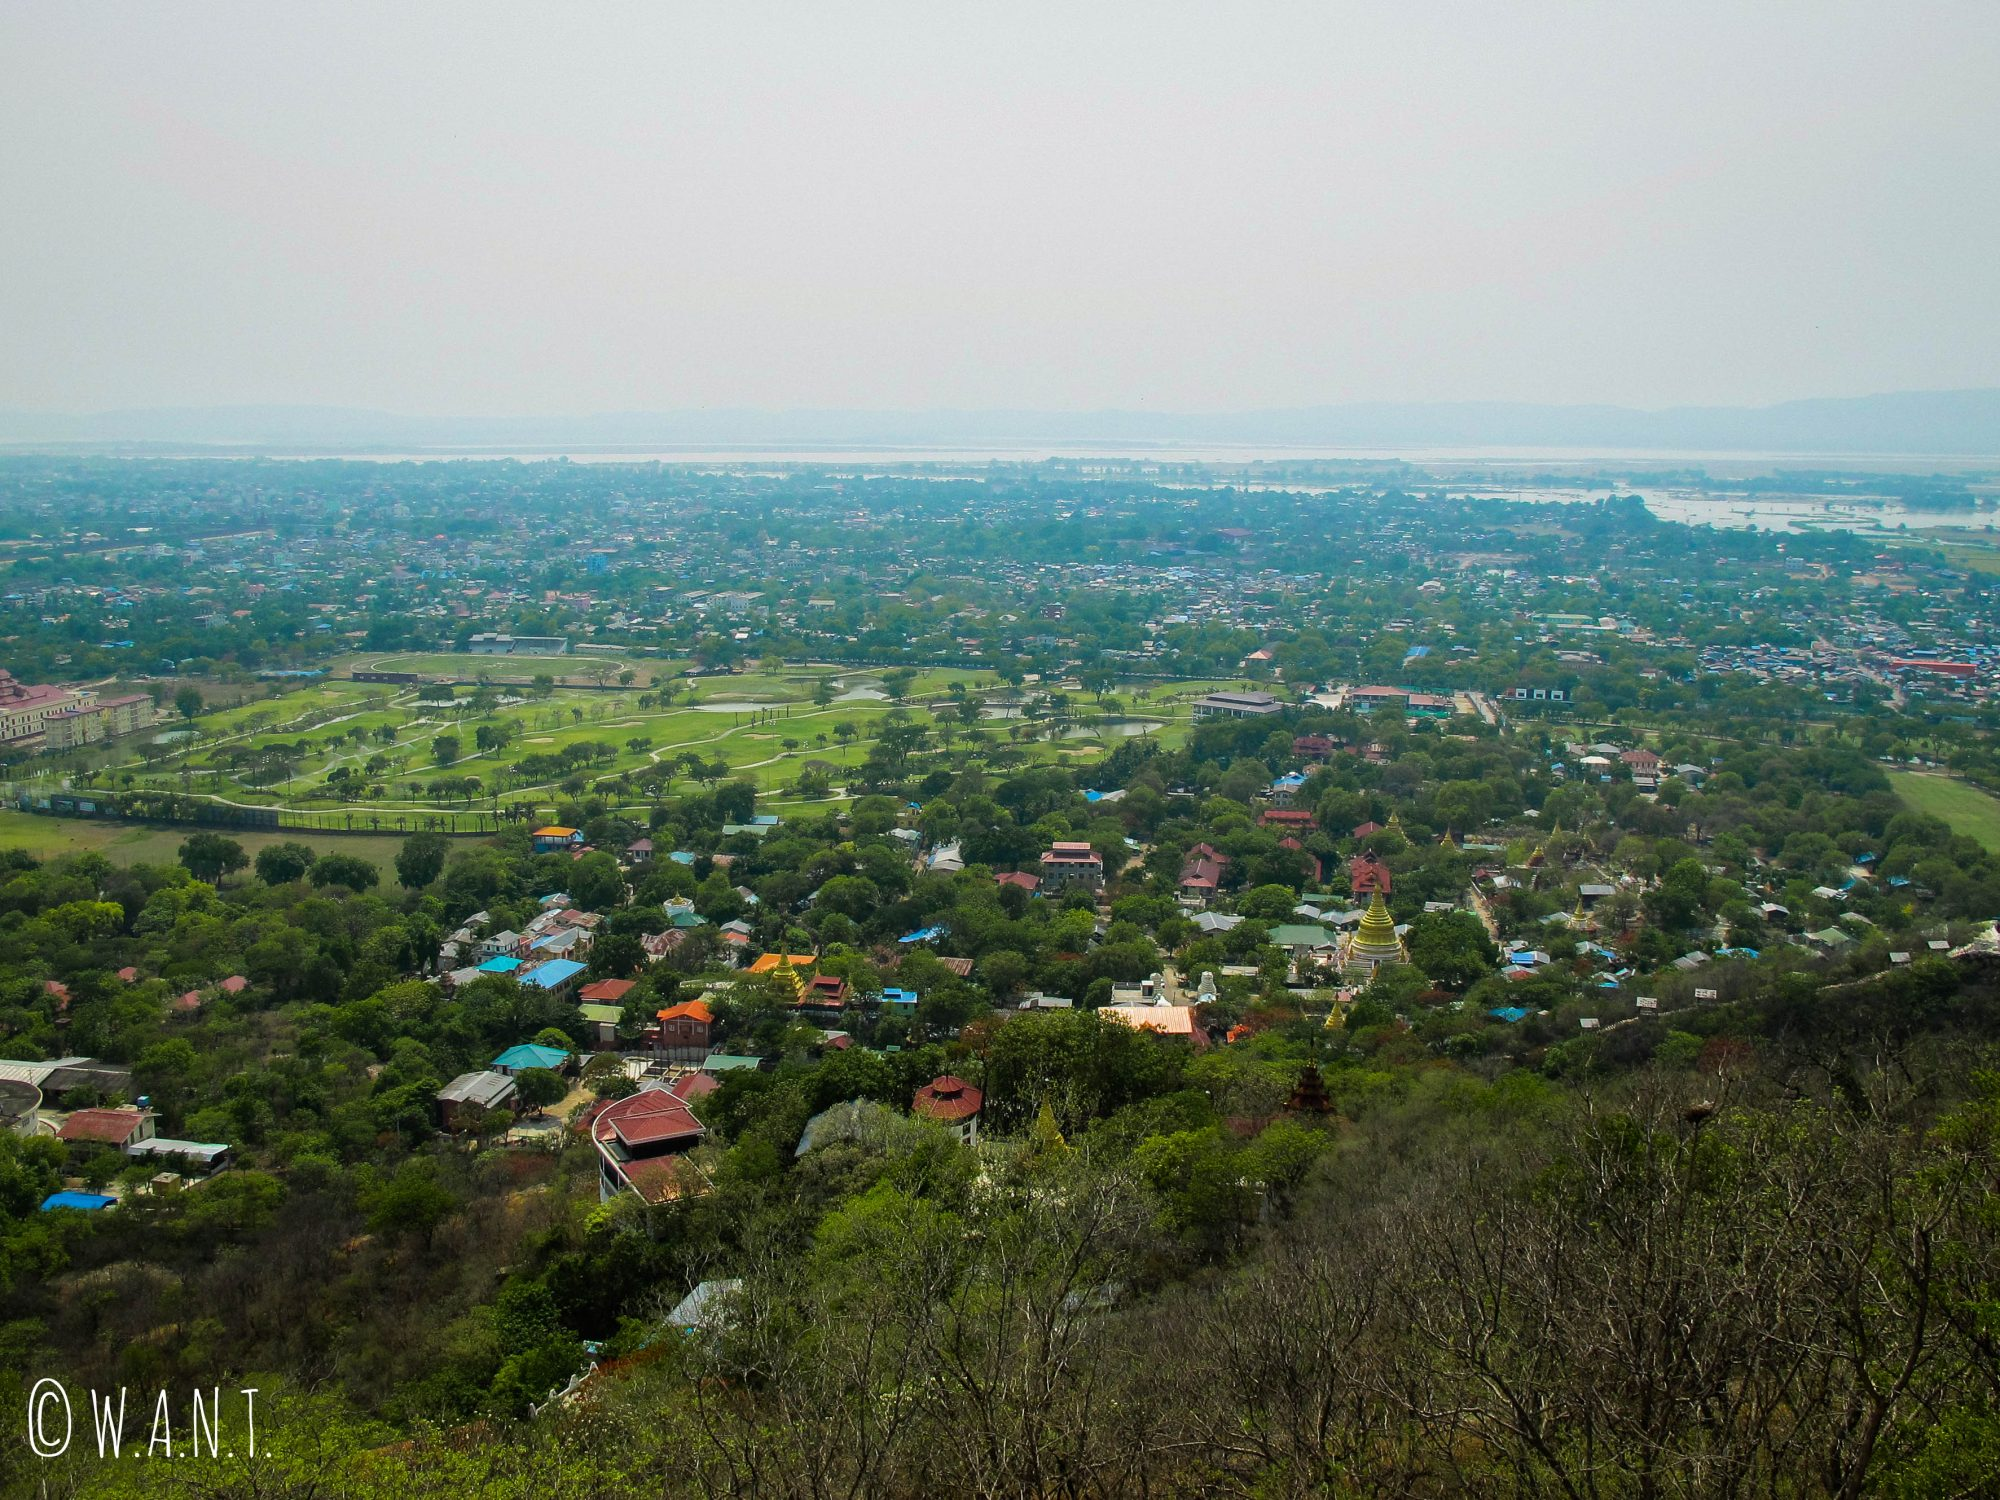 Vue depuis la pagode au sommet de Mandalay Hill